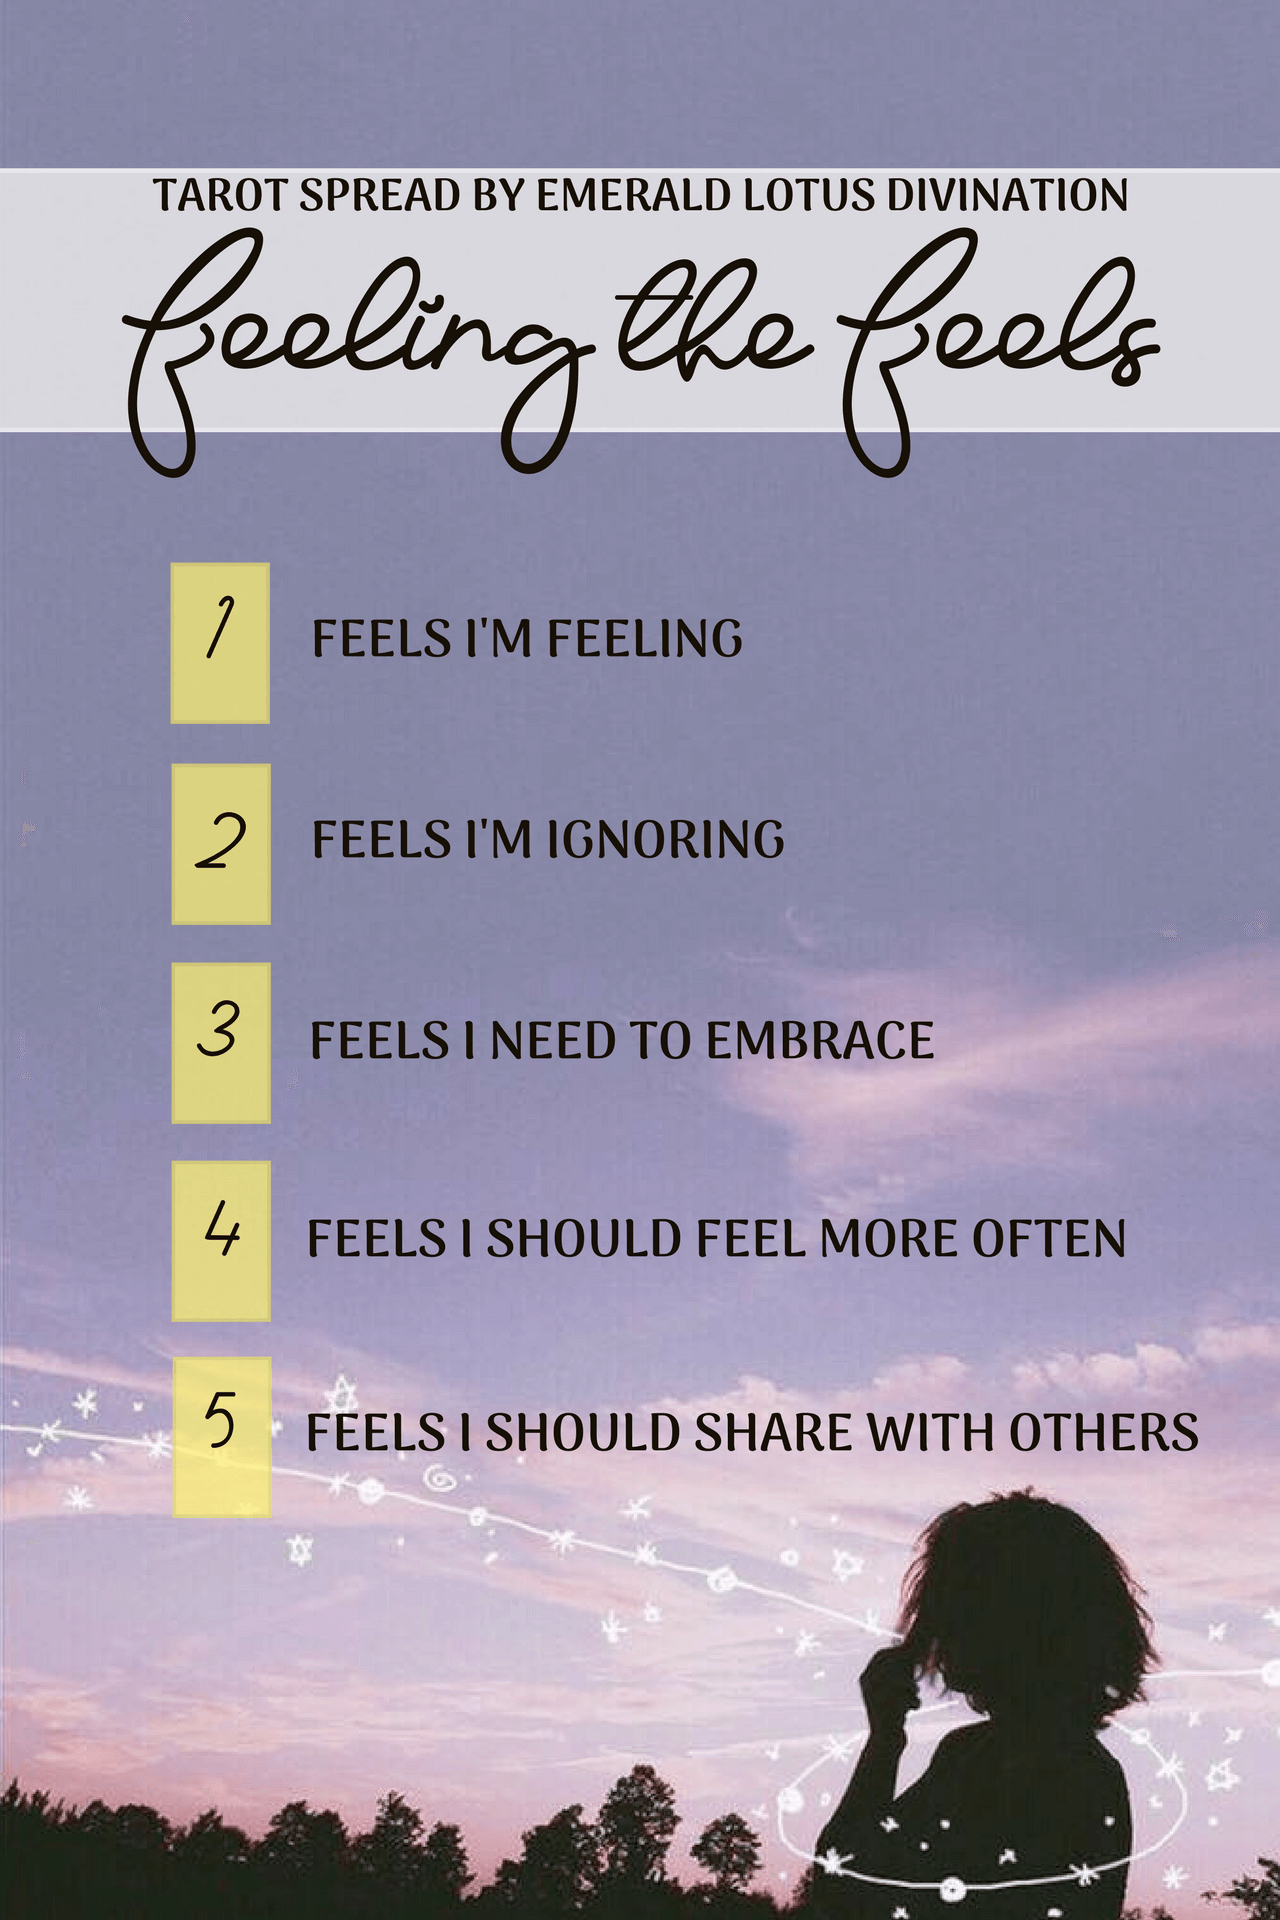 feeling-the-feels-tarot-spread-free-1.png